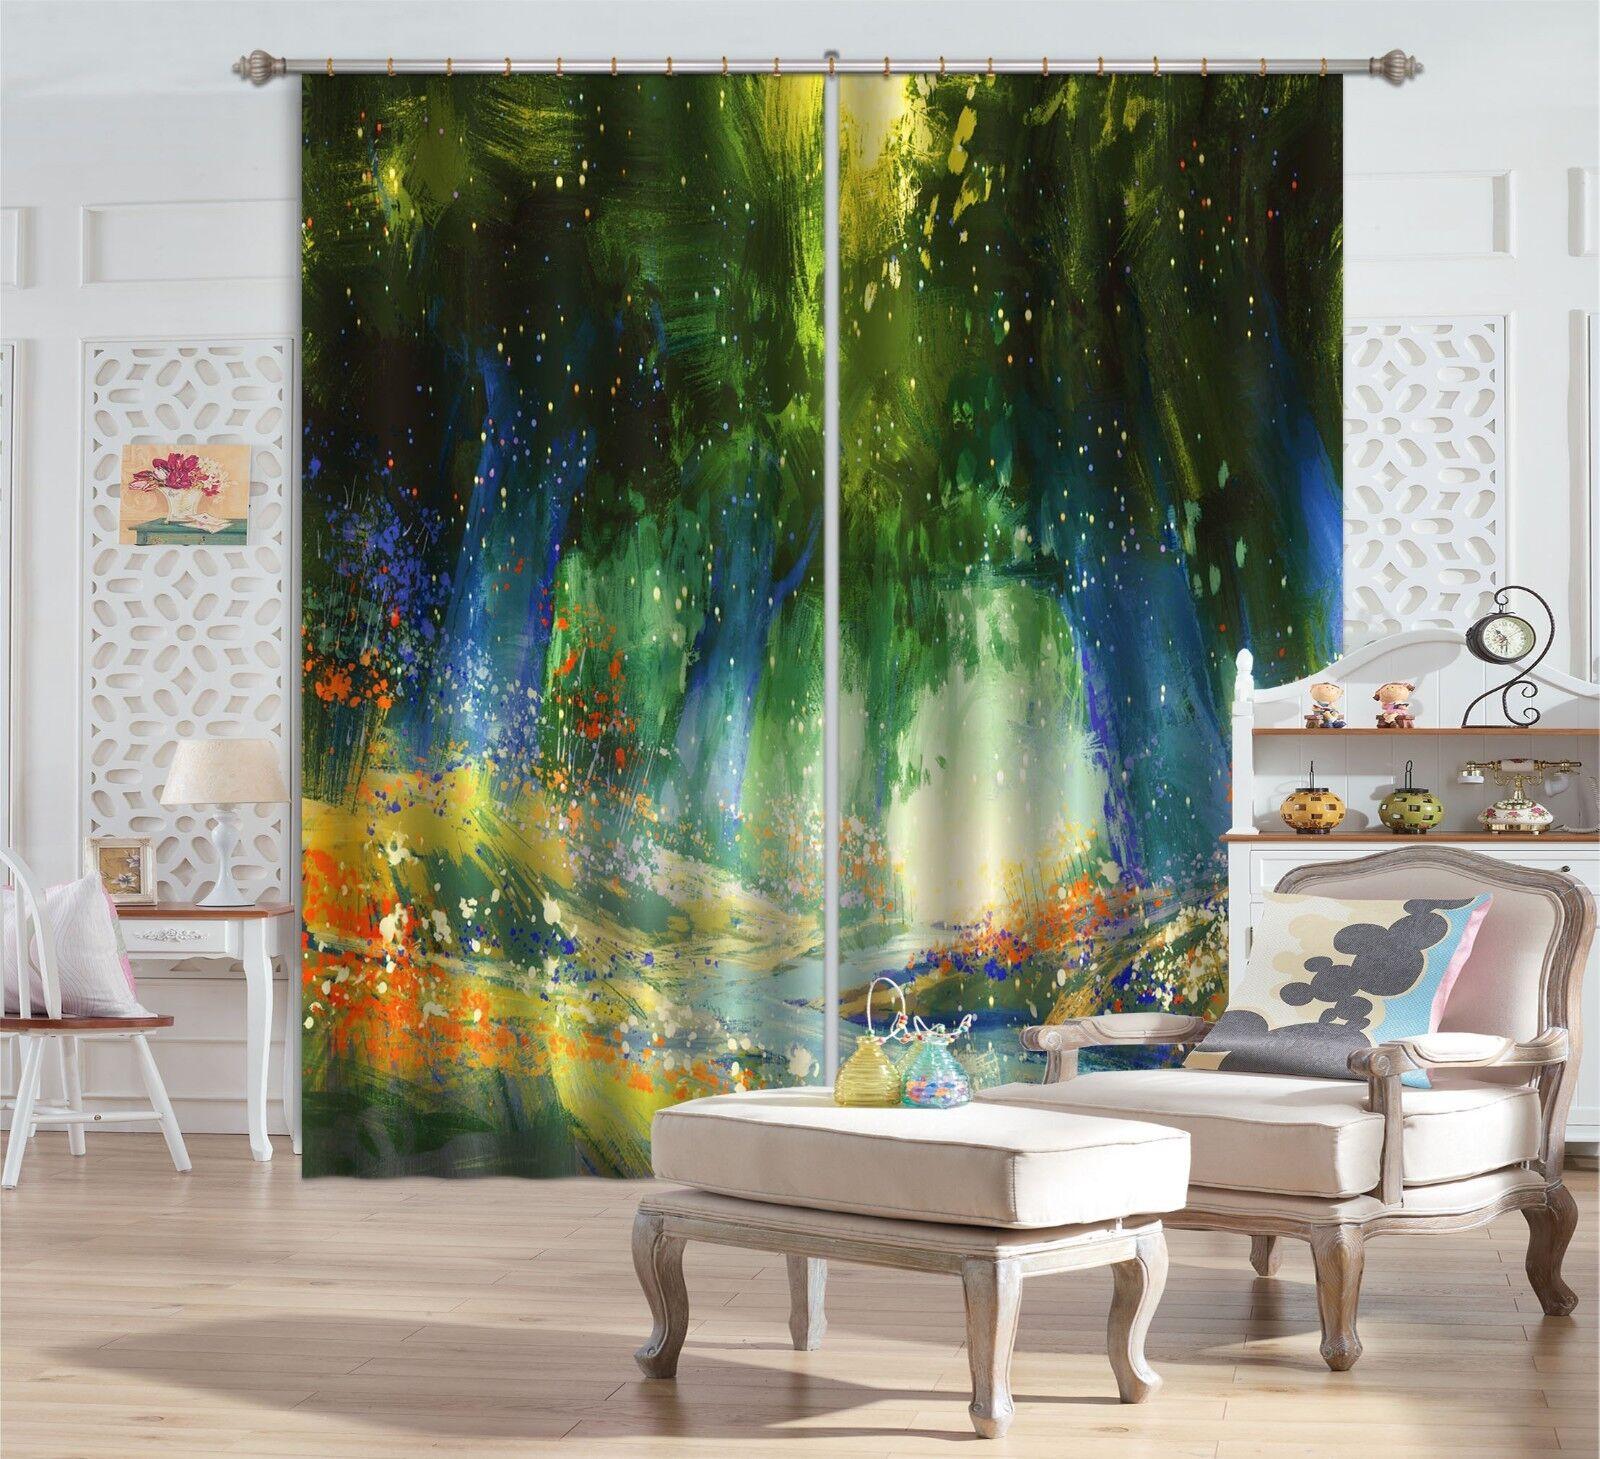 Flor de aceite 3D 3 Cortinas de impresión de cortina de foto Blockout Tela Cortinas Ventana au